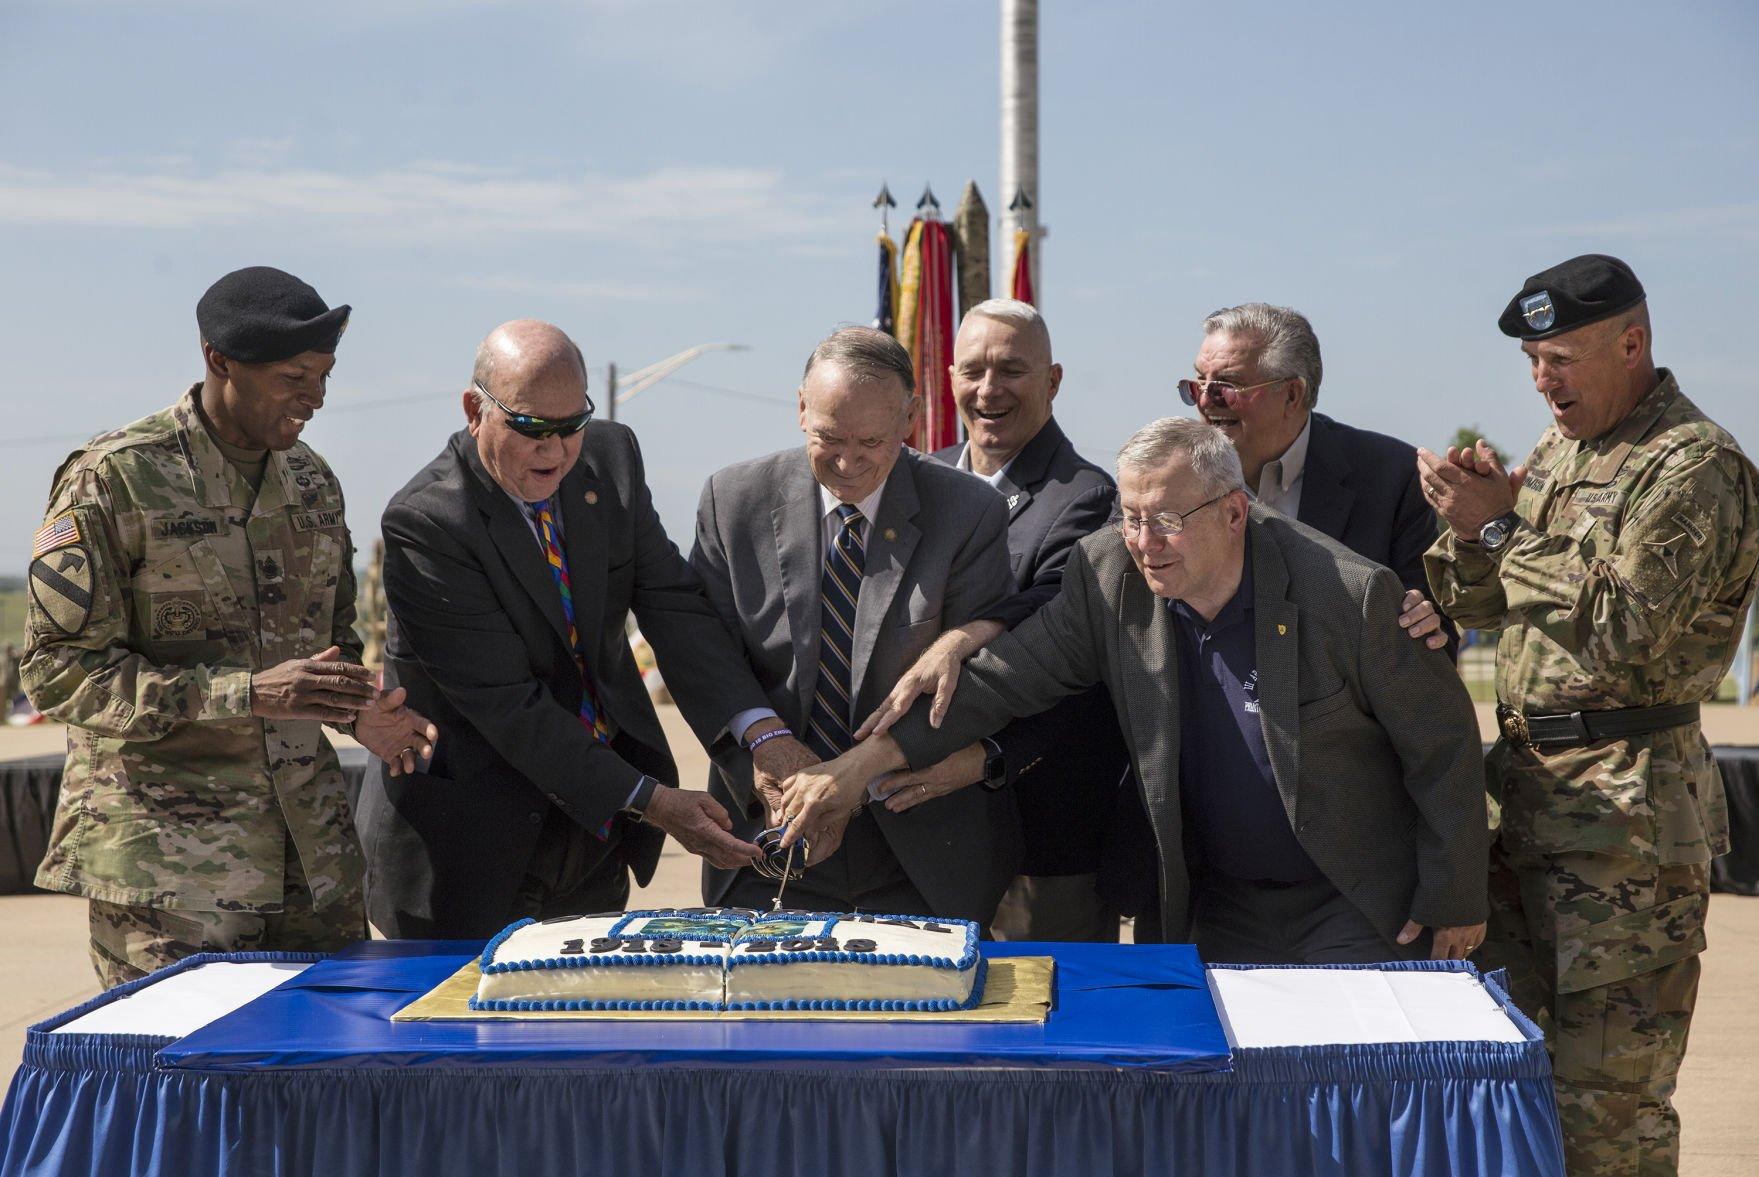 Army Birthday III Corps celebrates 100th anniversary